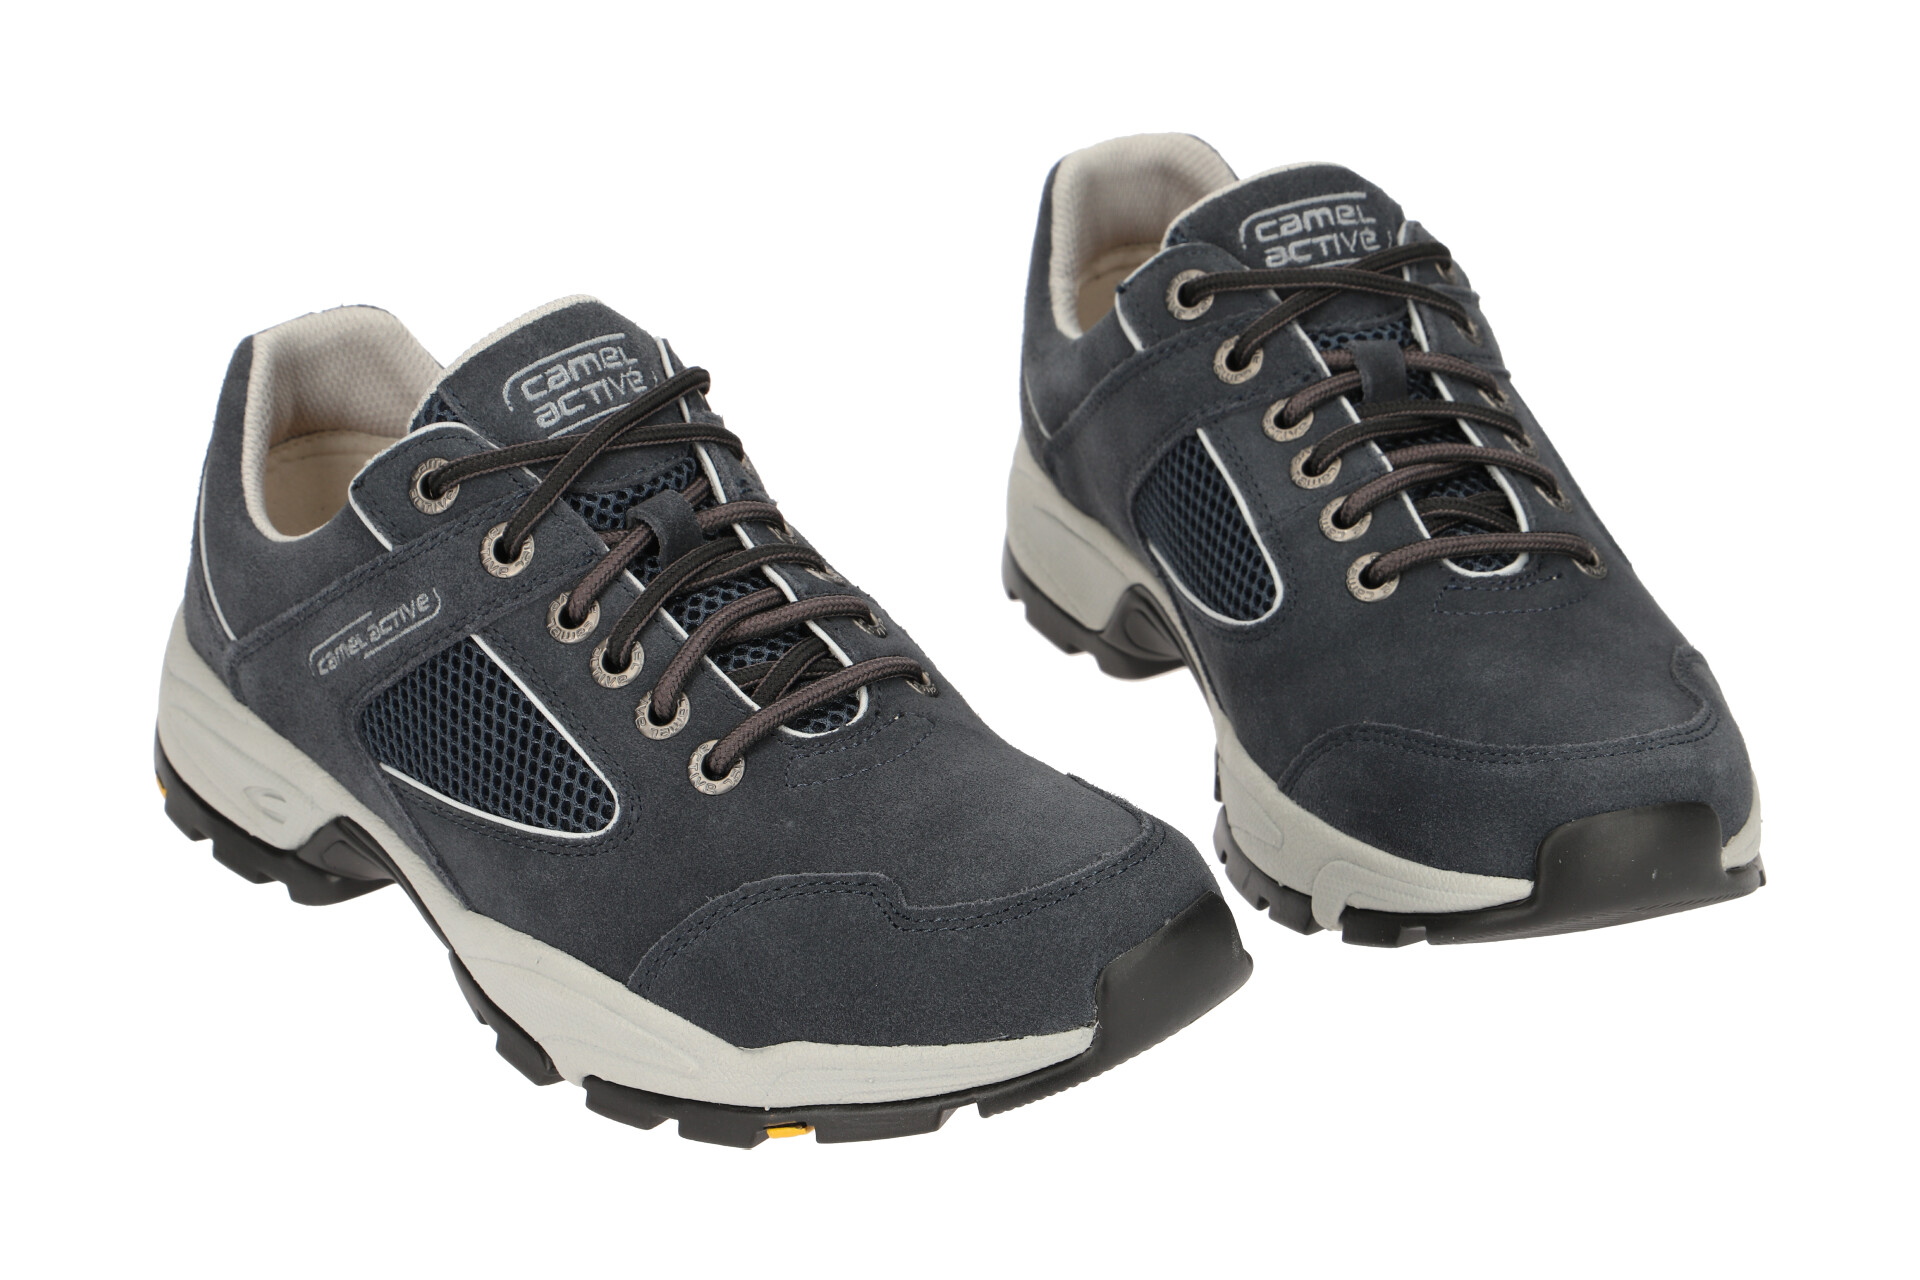 0e8b7b3b7208 Details zu camel active Schuhe EVOLUTION blau Herrenschuhe sportliche  Halbschuhe 138.11.27